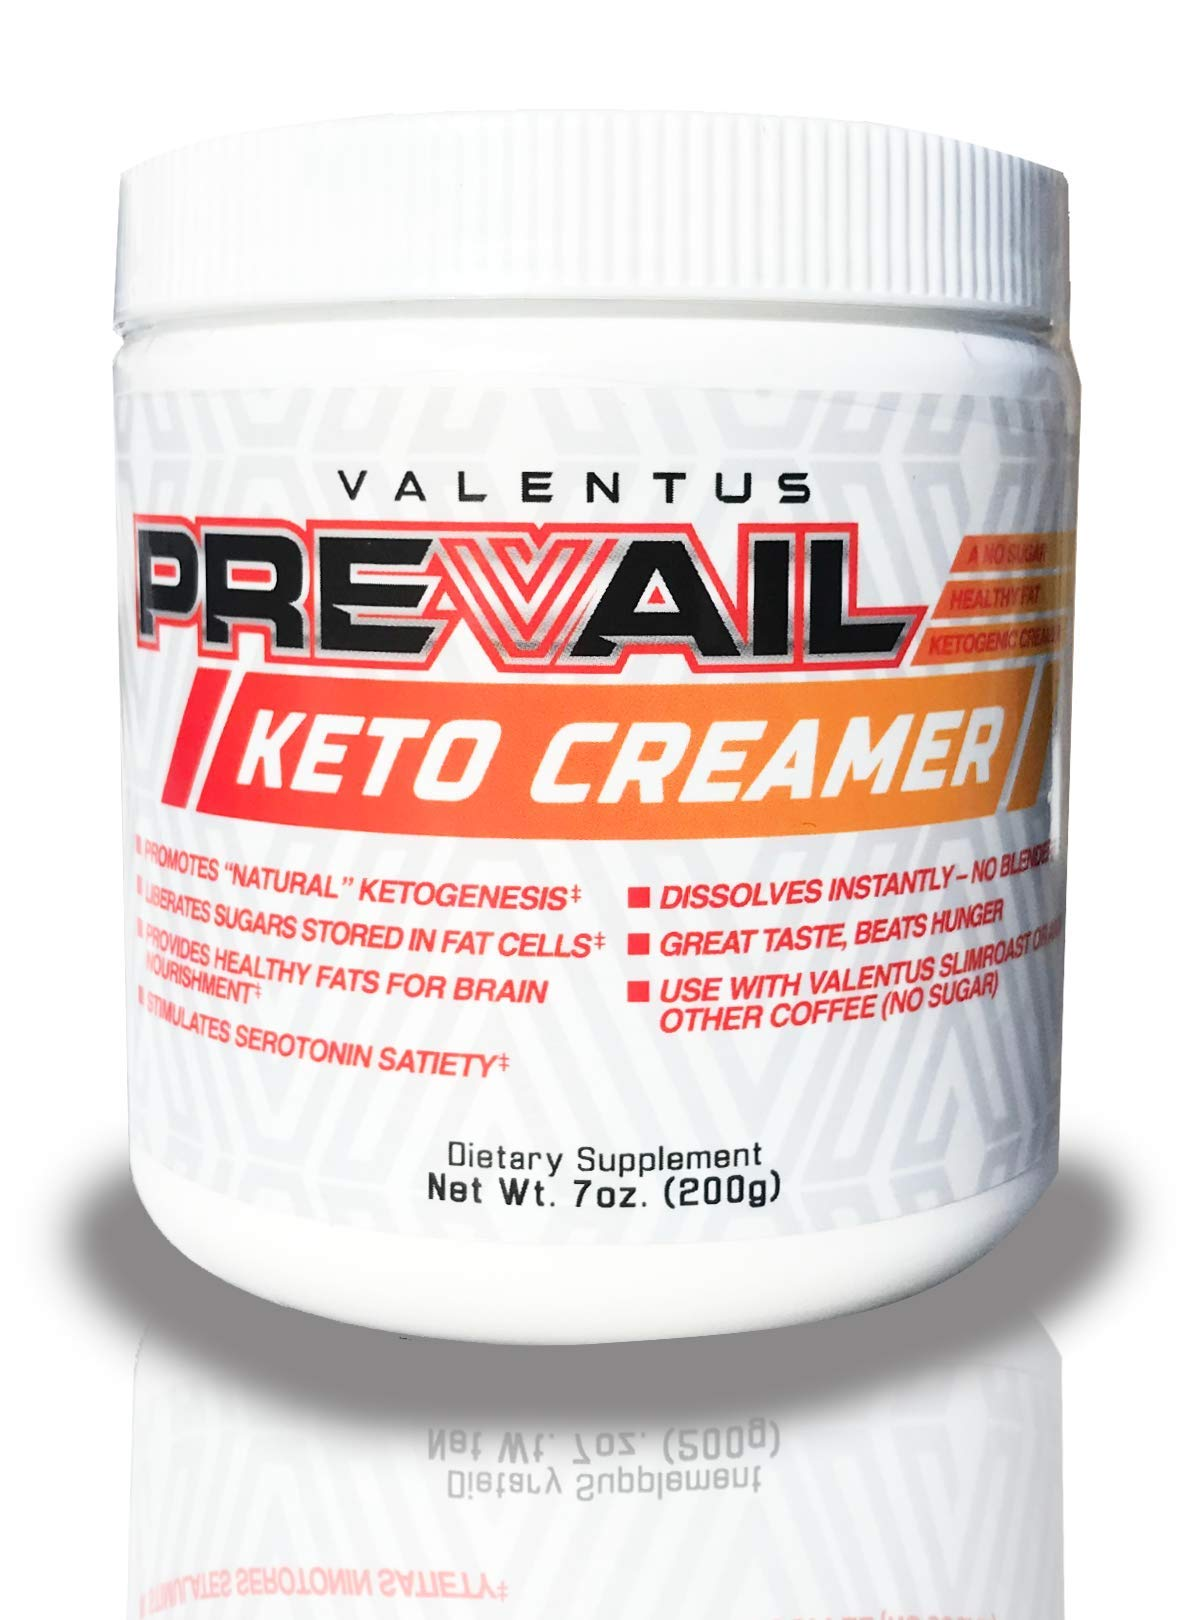 Valentus Prevail Keto Coffee Creamer: Mct Oil Powder 7 Oz | 20 Servings by VALENTUS